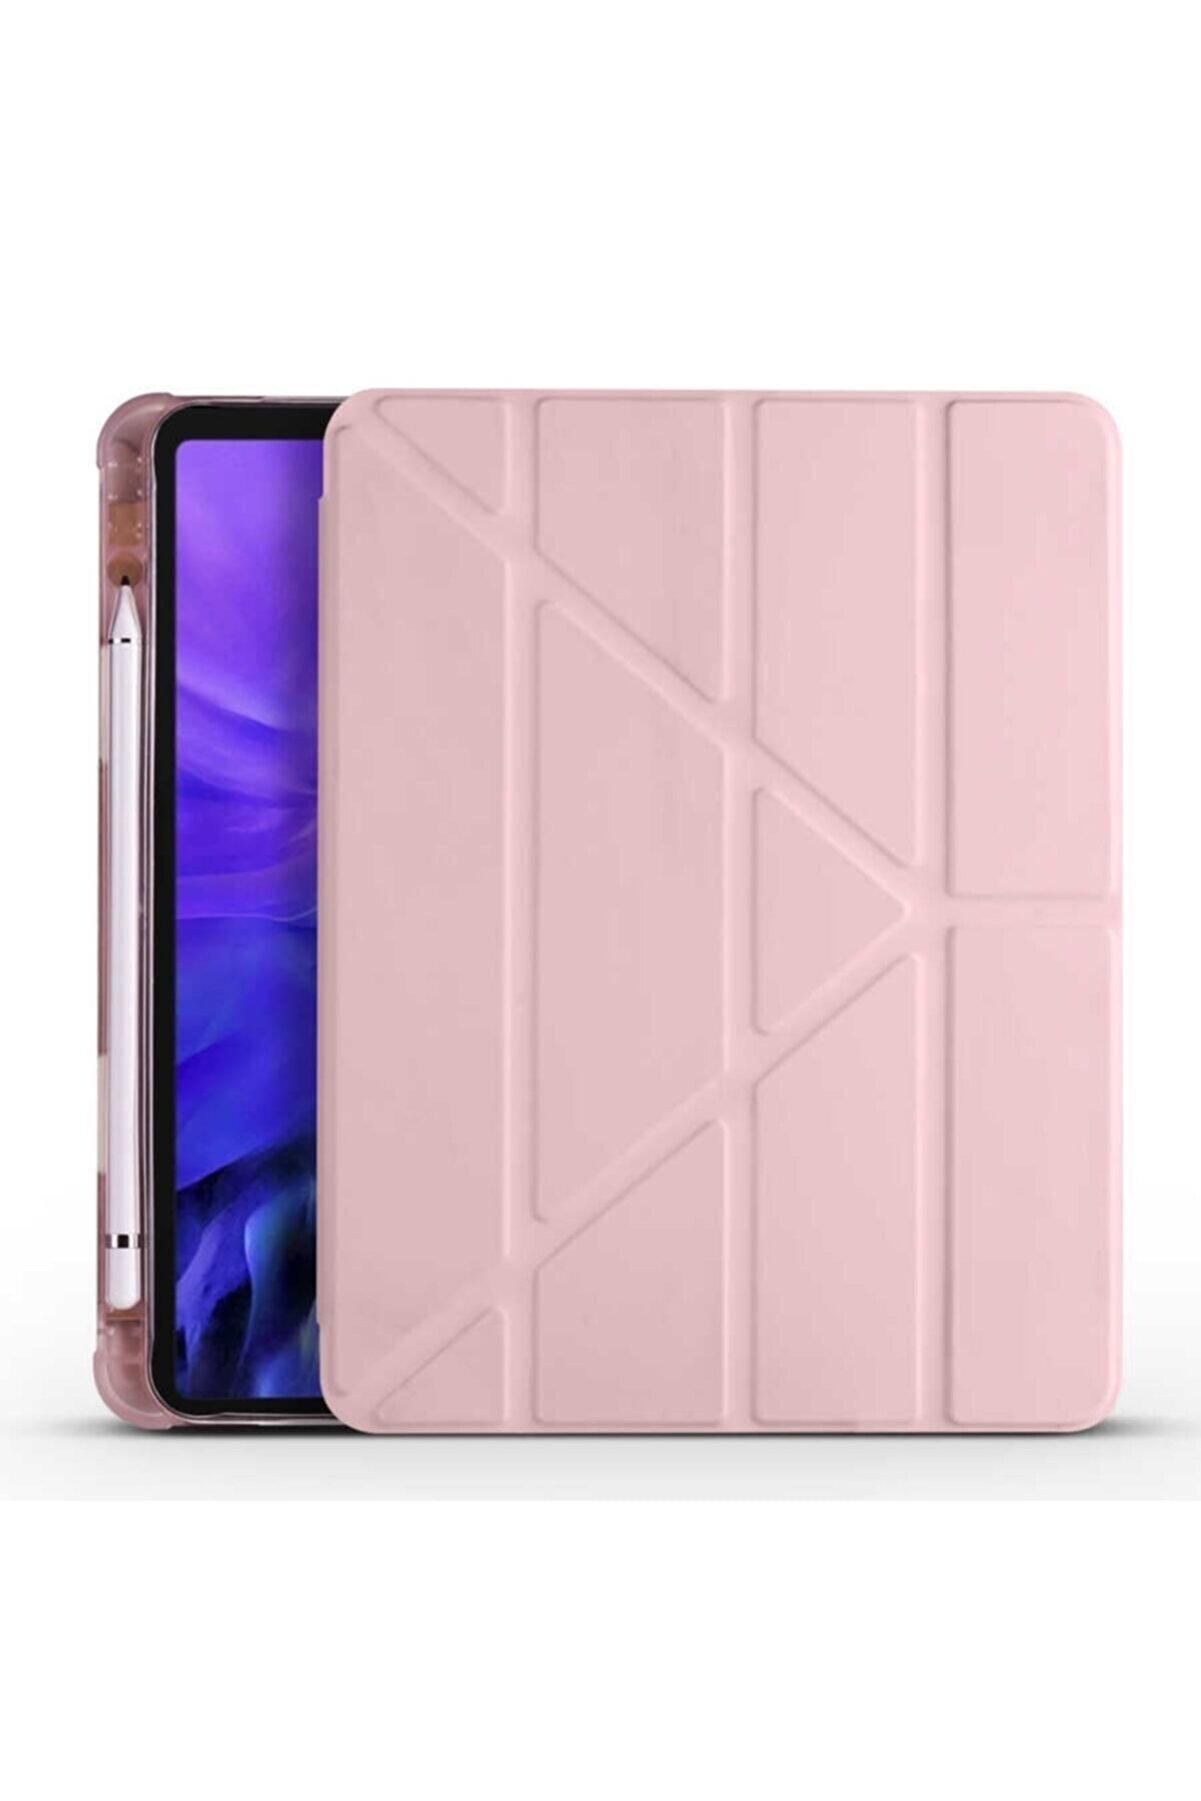 Samsung Galaxy Tab S6 Lite P610 Kılıf Tri Folding Smart Cover Standlı Kalemlikli Kapak Pembe